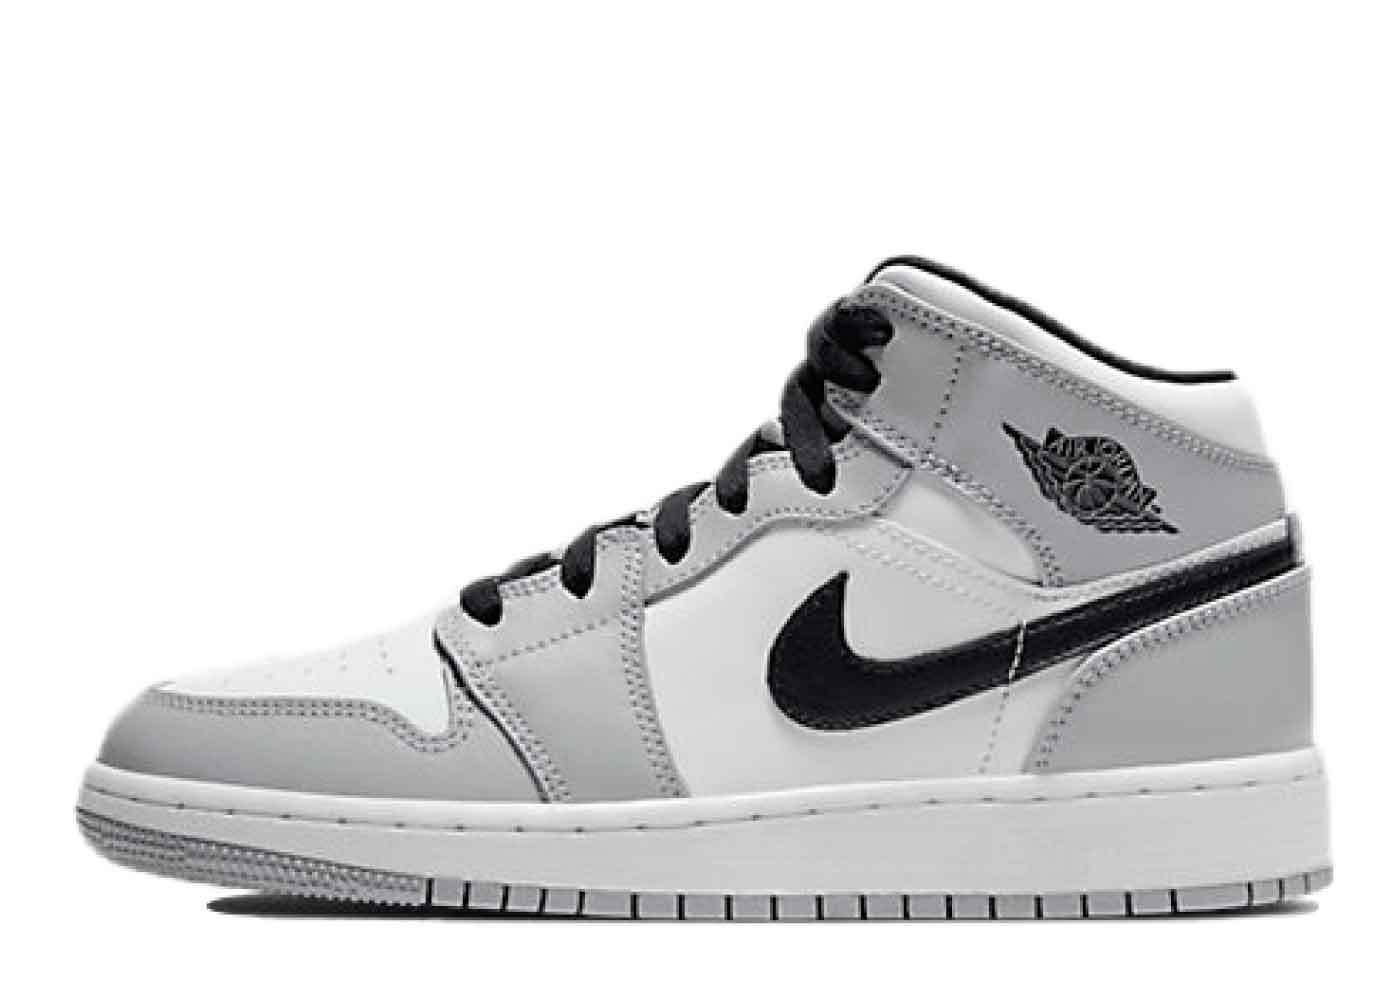 Nike Air Jordan 1 Mid Light Smoke Grey (GS)の写真